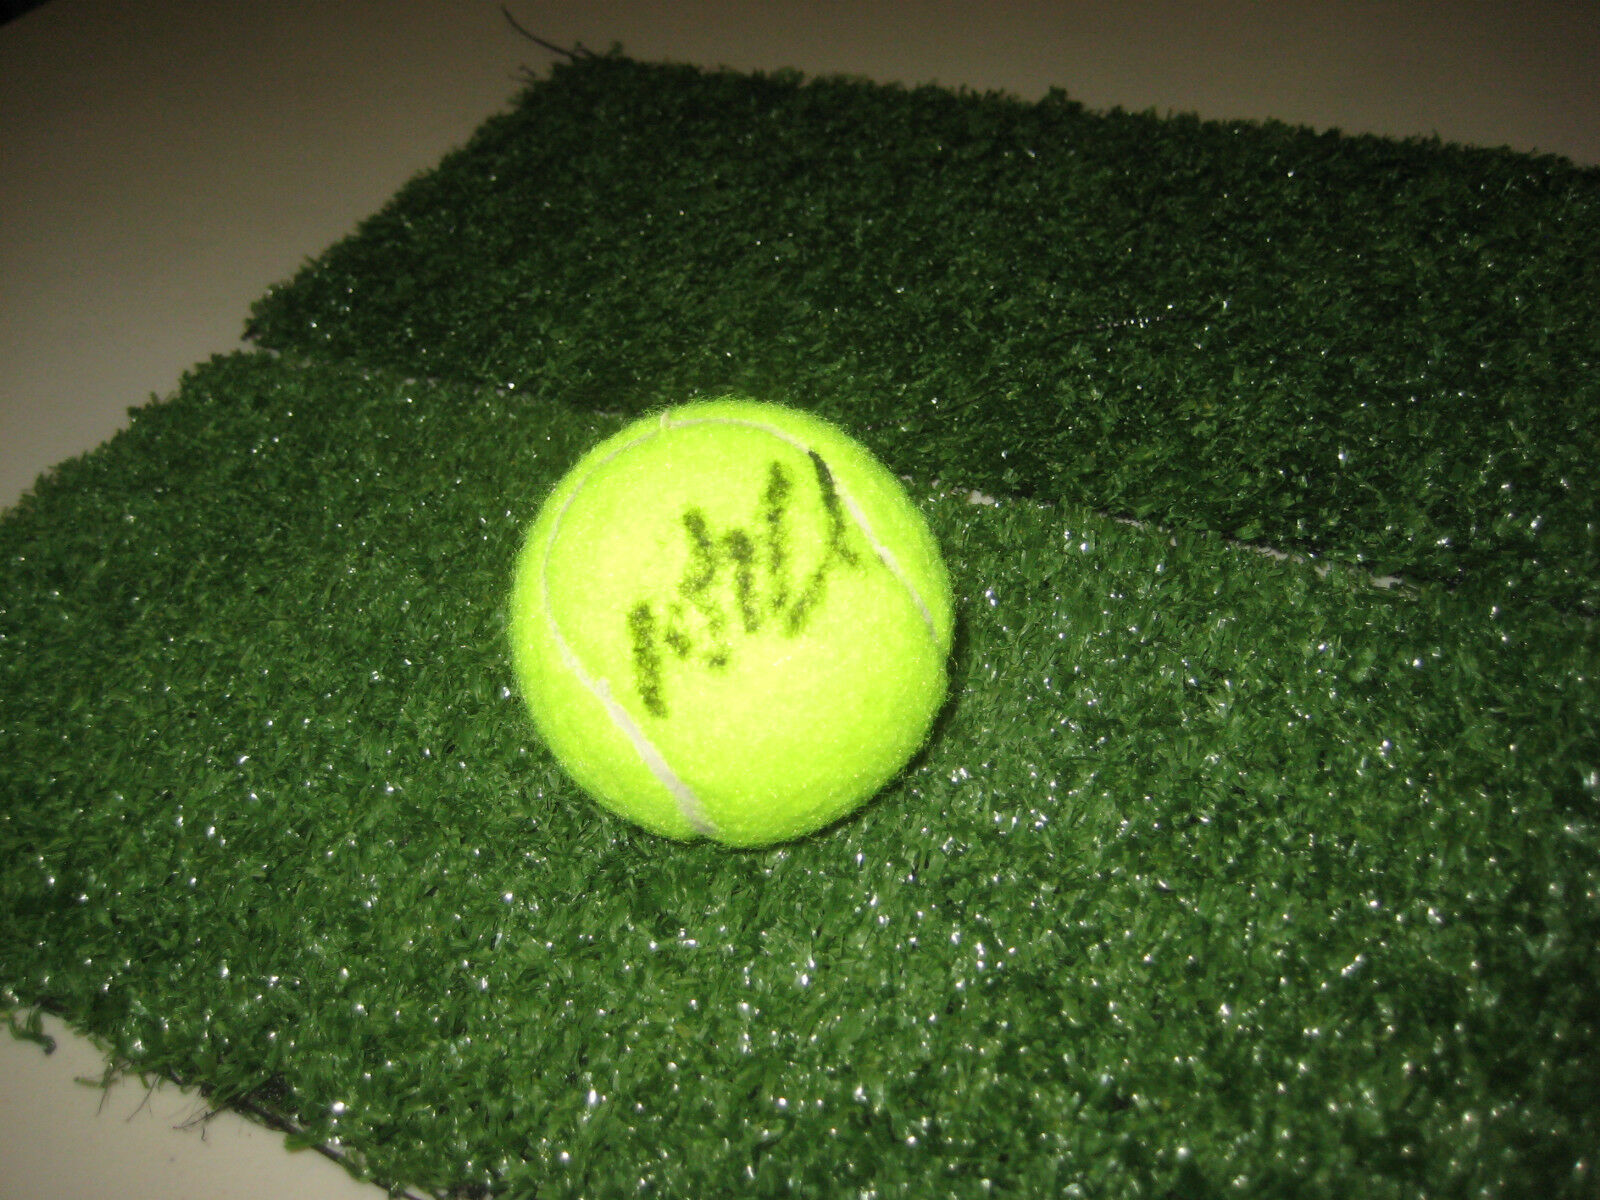 AGNIESZKA RADWANSKA HAND SIGNED TENNIS BALL UNFRAMED + PHOTO PROOF + C.O.A